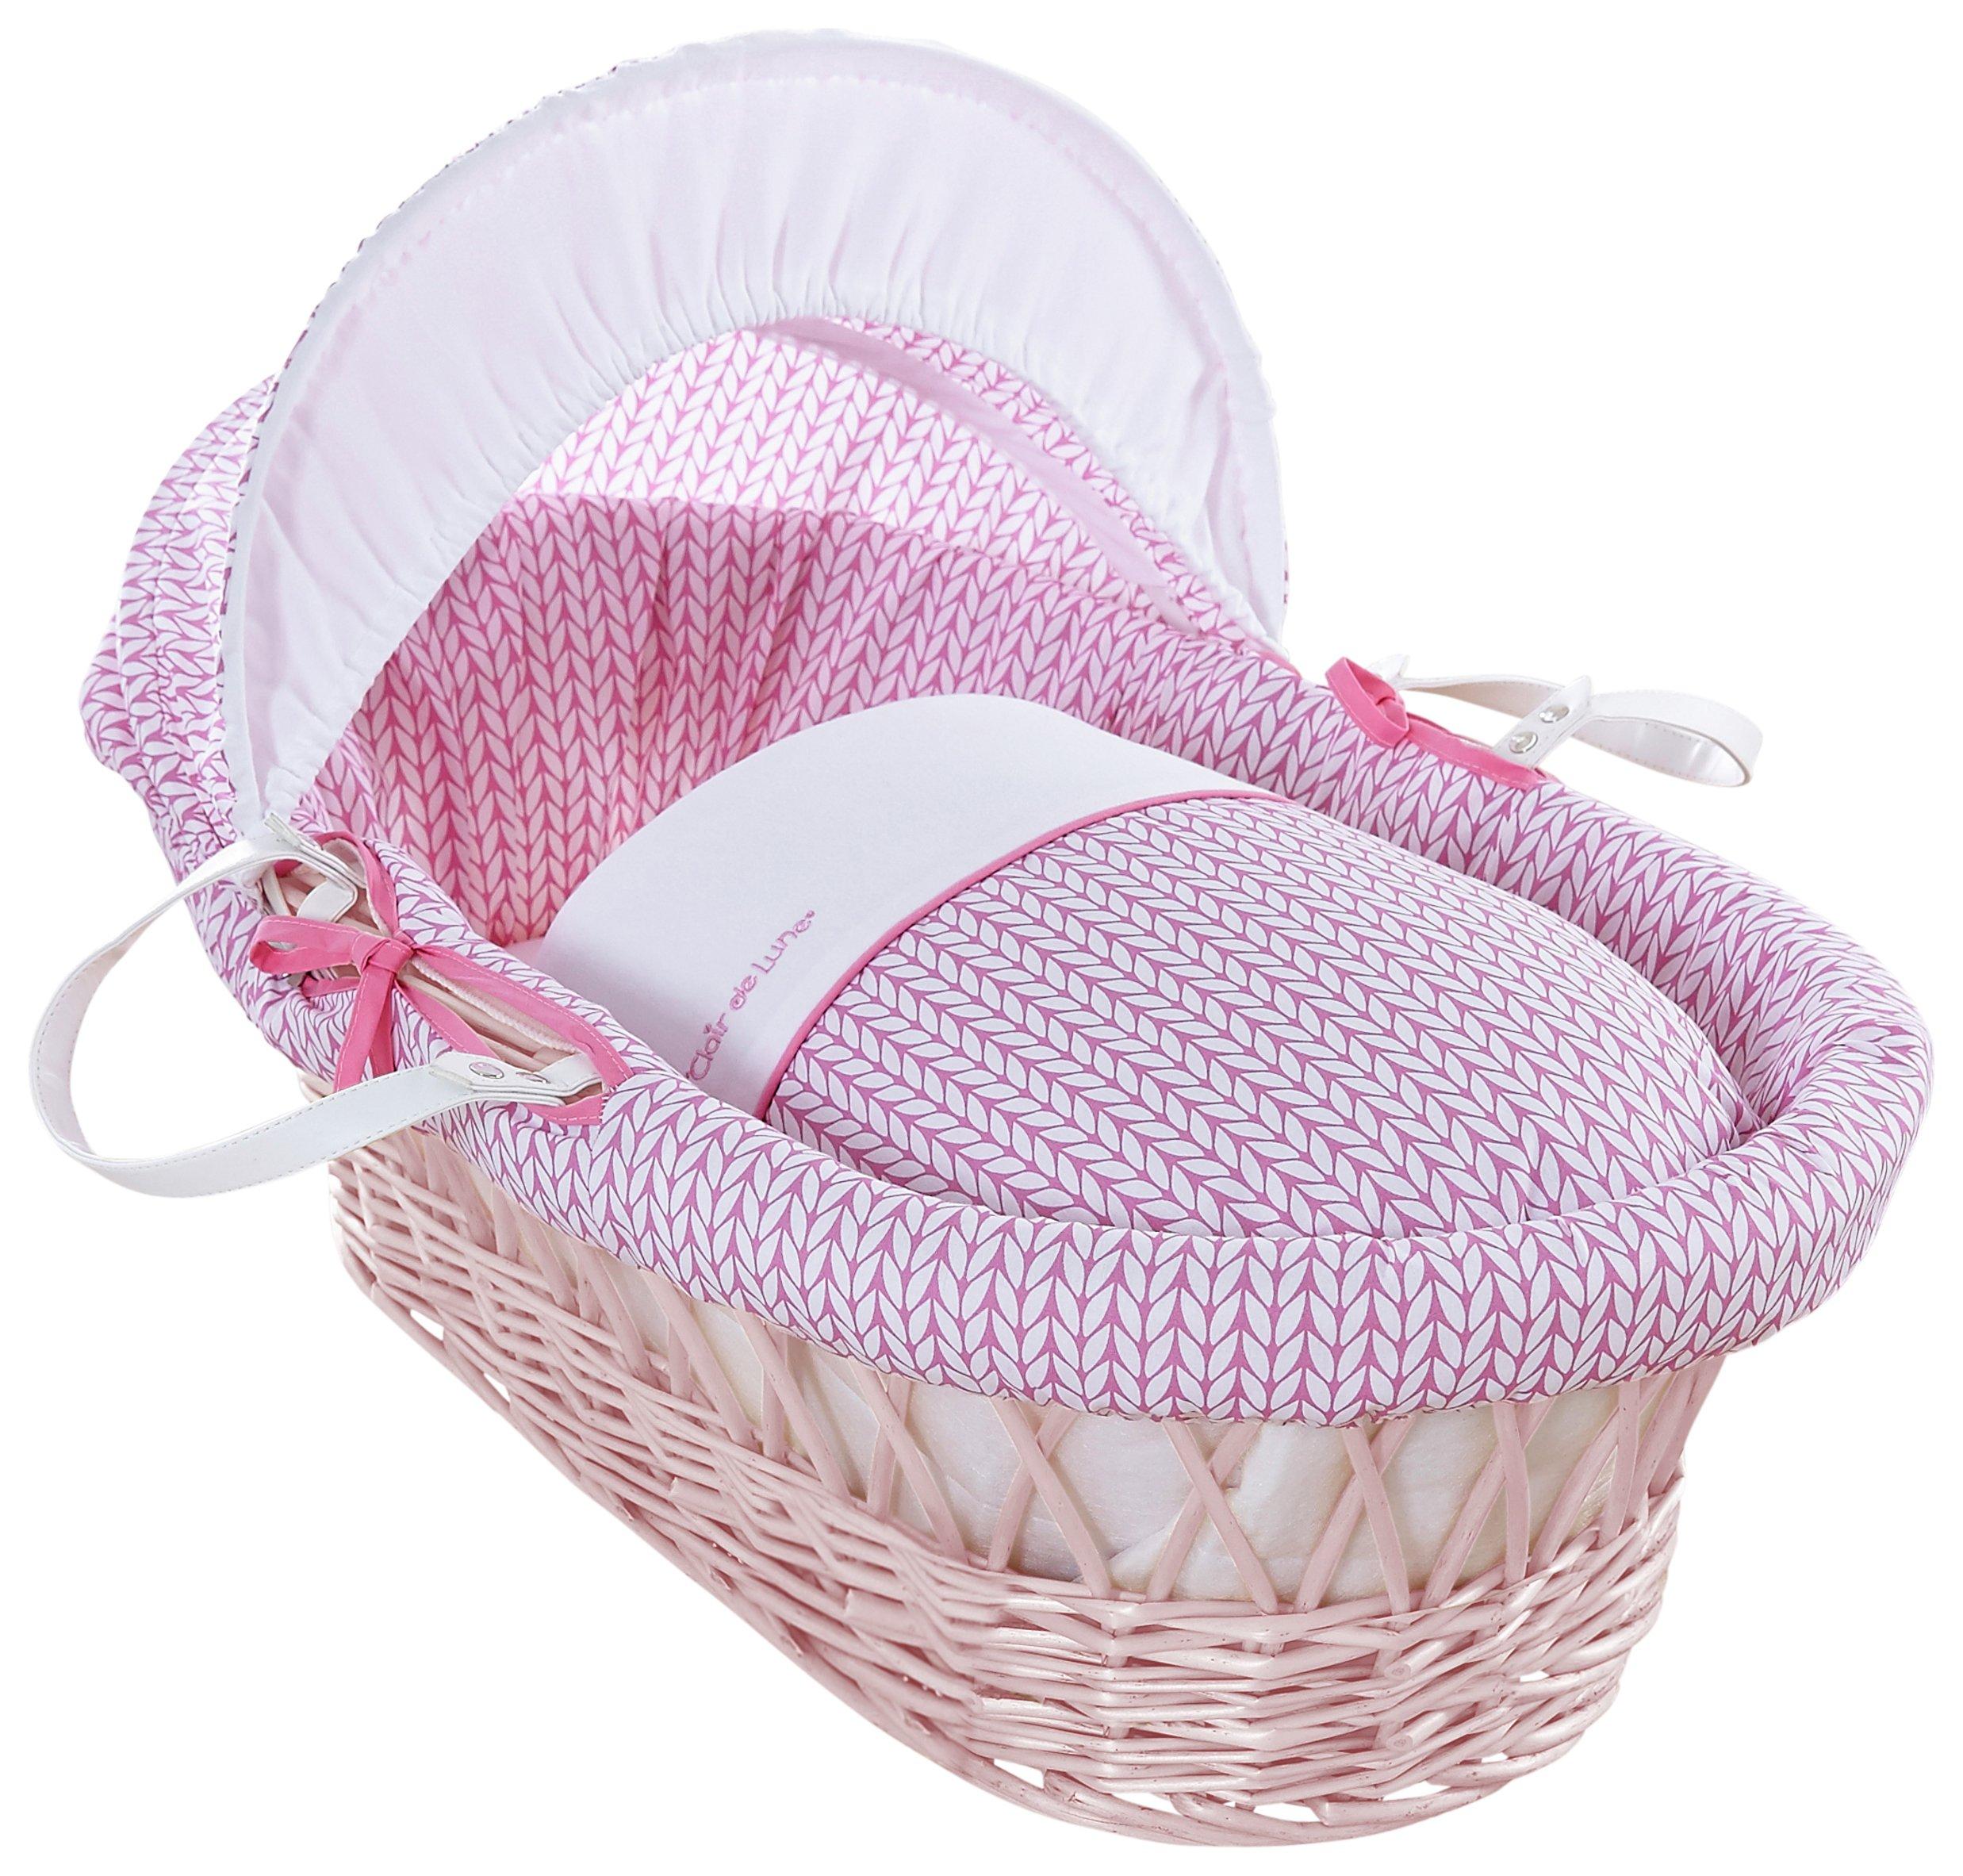 Image of Clair de Lune Pink Barley B??b?? Pink Wicker Moses Basket